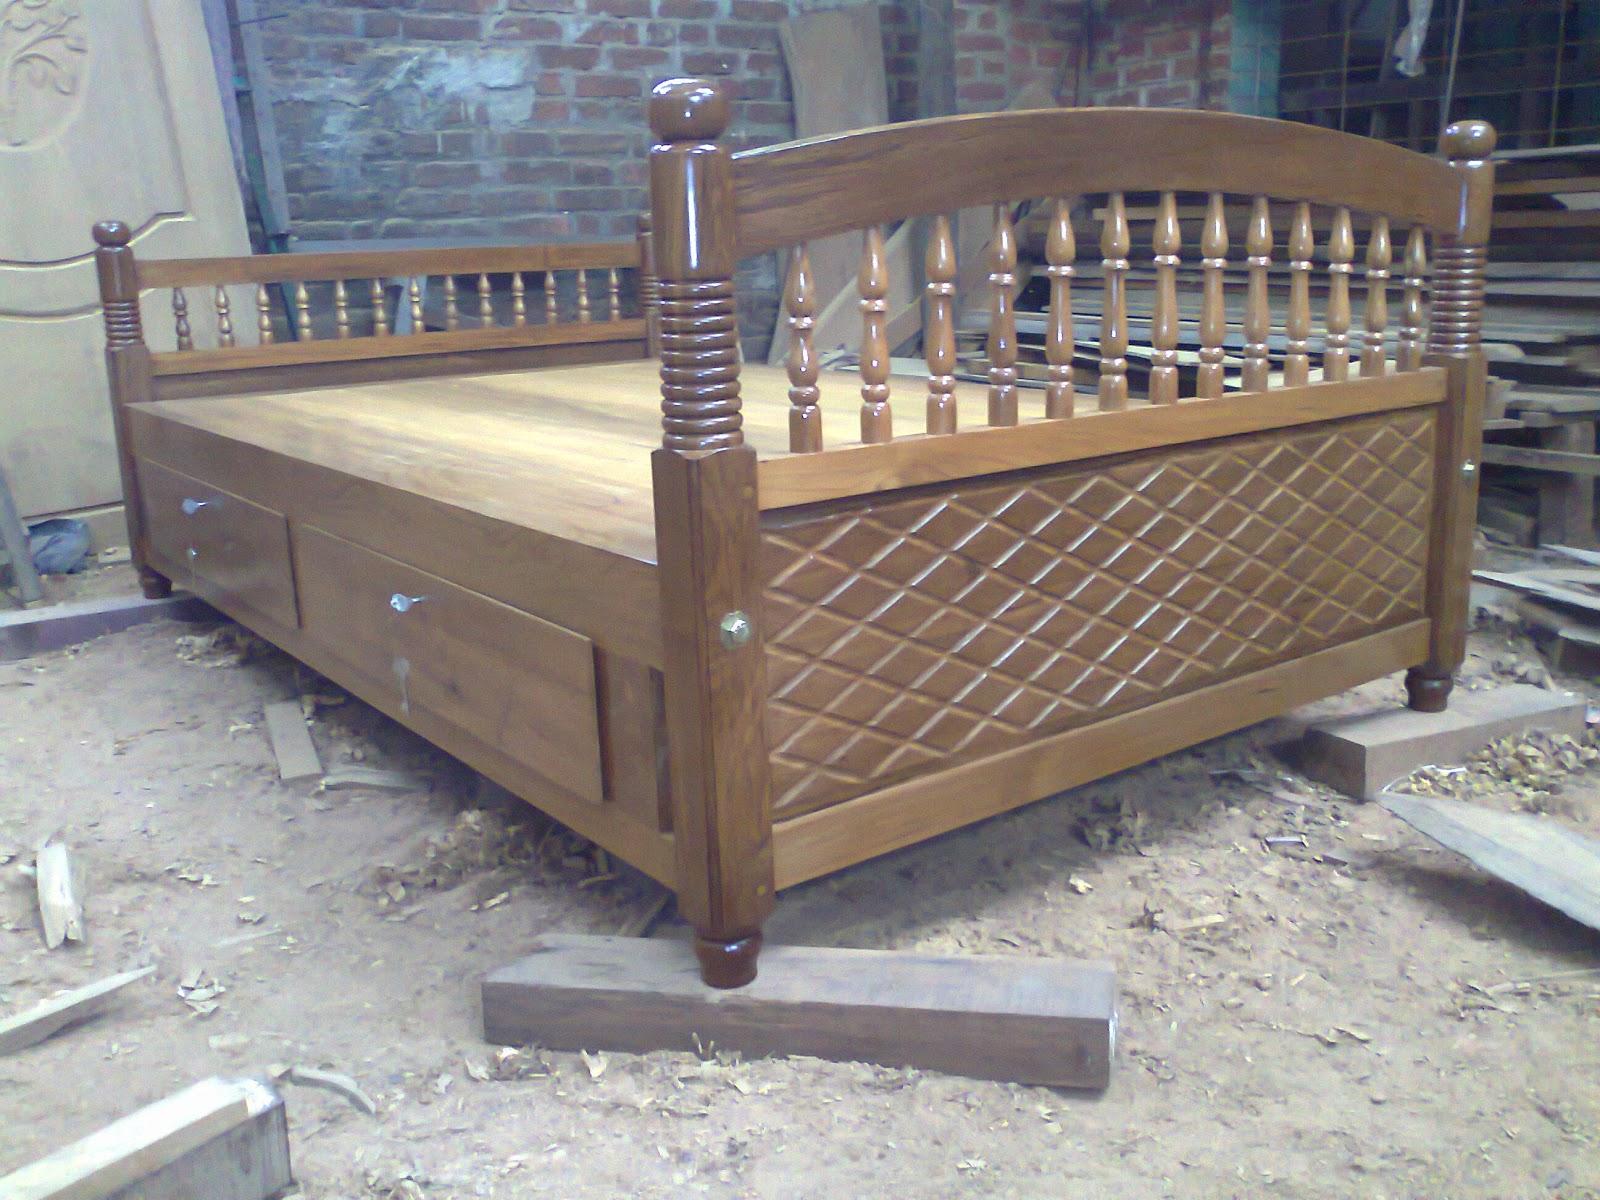 Anand Furnitures Box Drawer Teak Wooden Cot